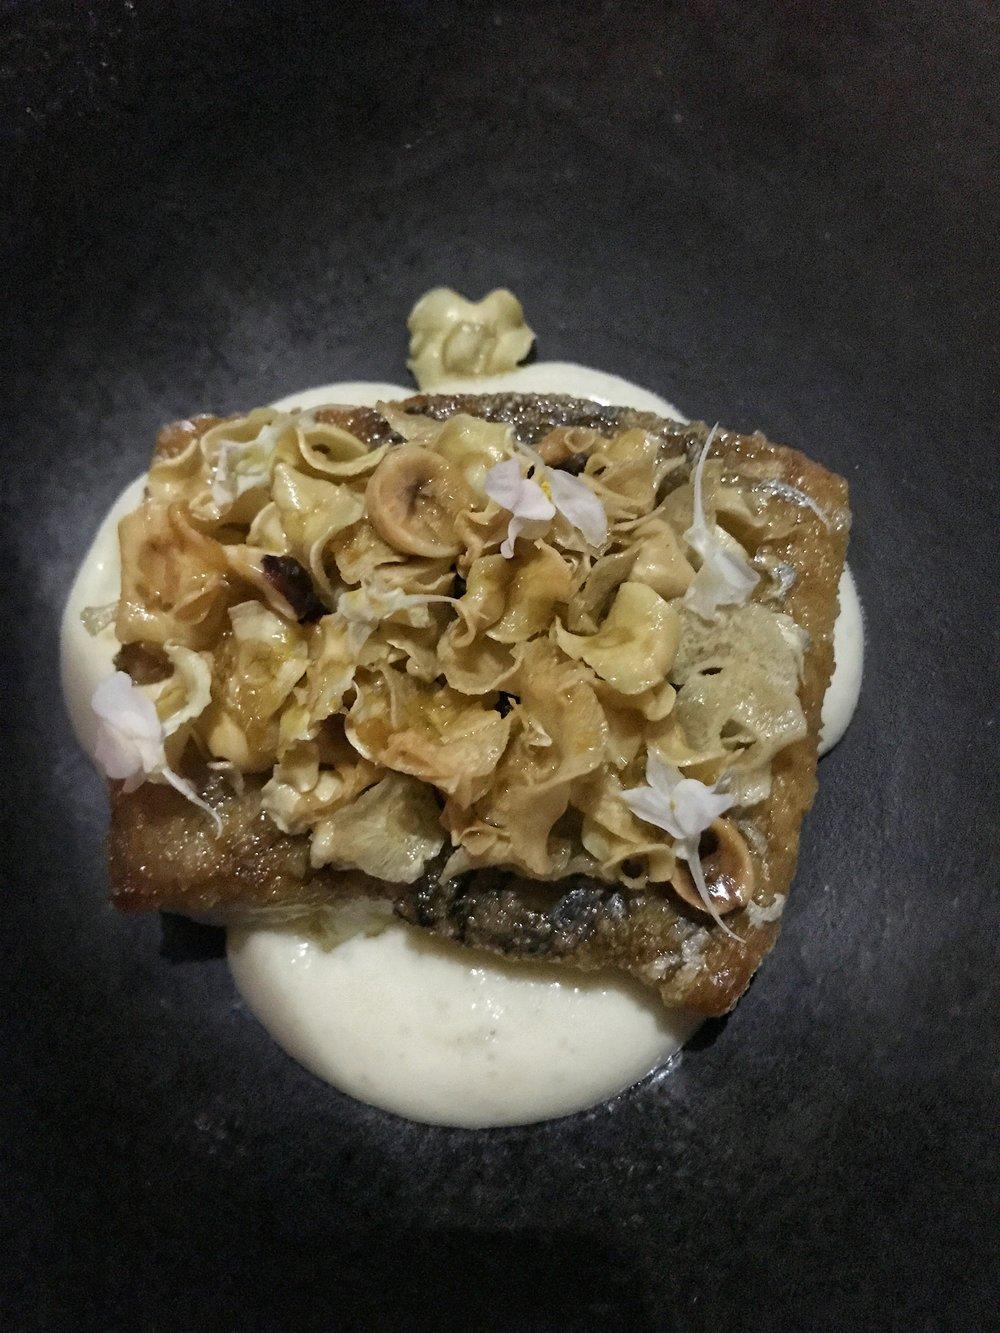 The Wild Cape York barramundi with crisp parsnip & hazelnuts and whole lemon puree.